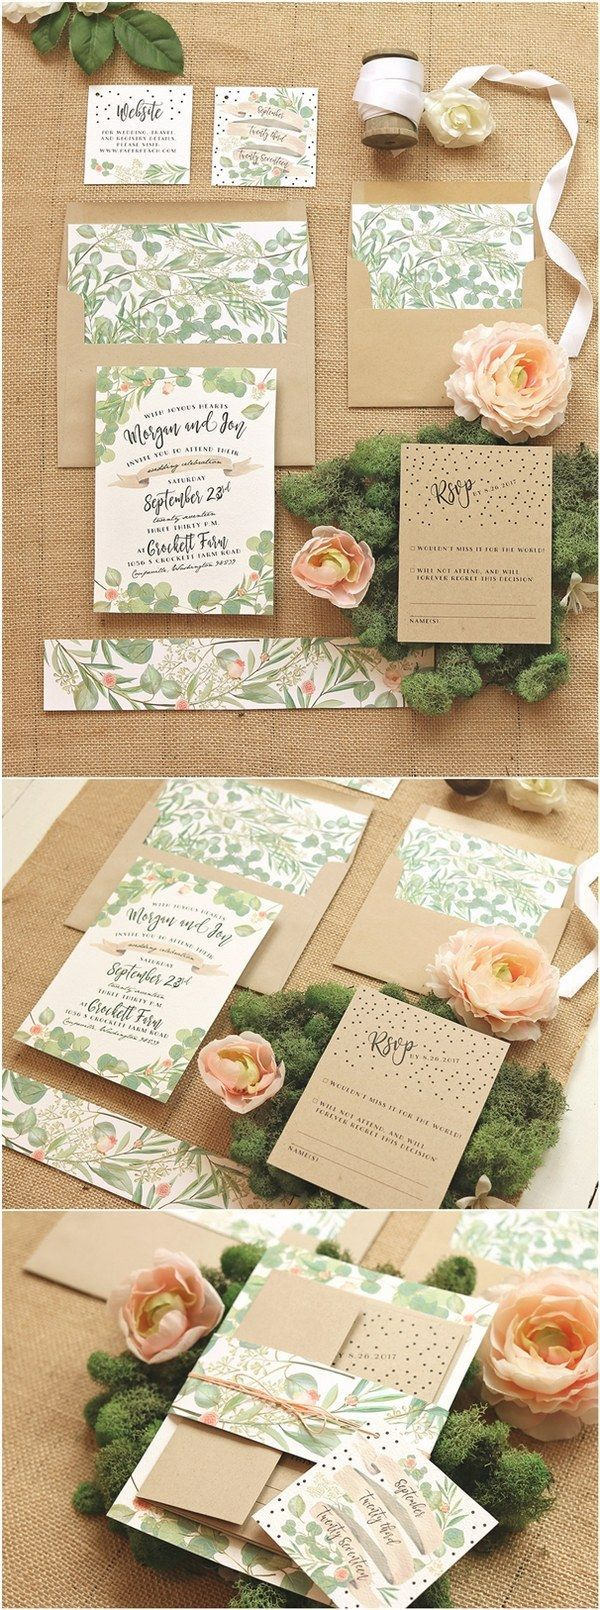 bed bath and beyond wedding invitation kits%0A    Chic Wedding Invitations found on Etsy